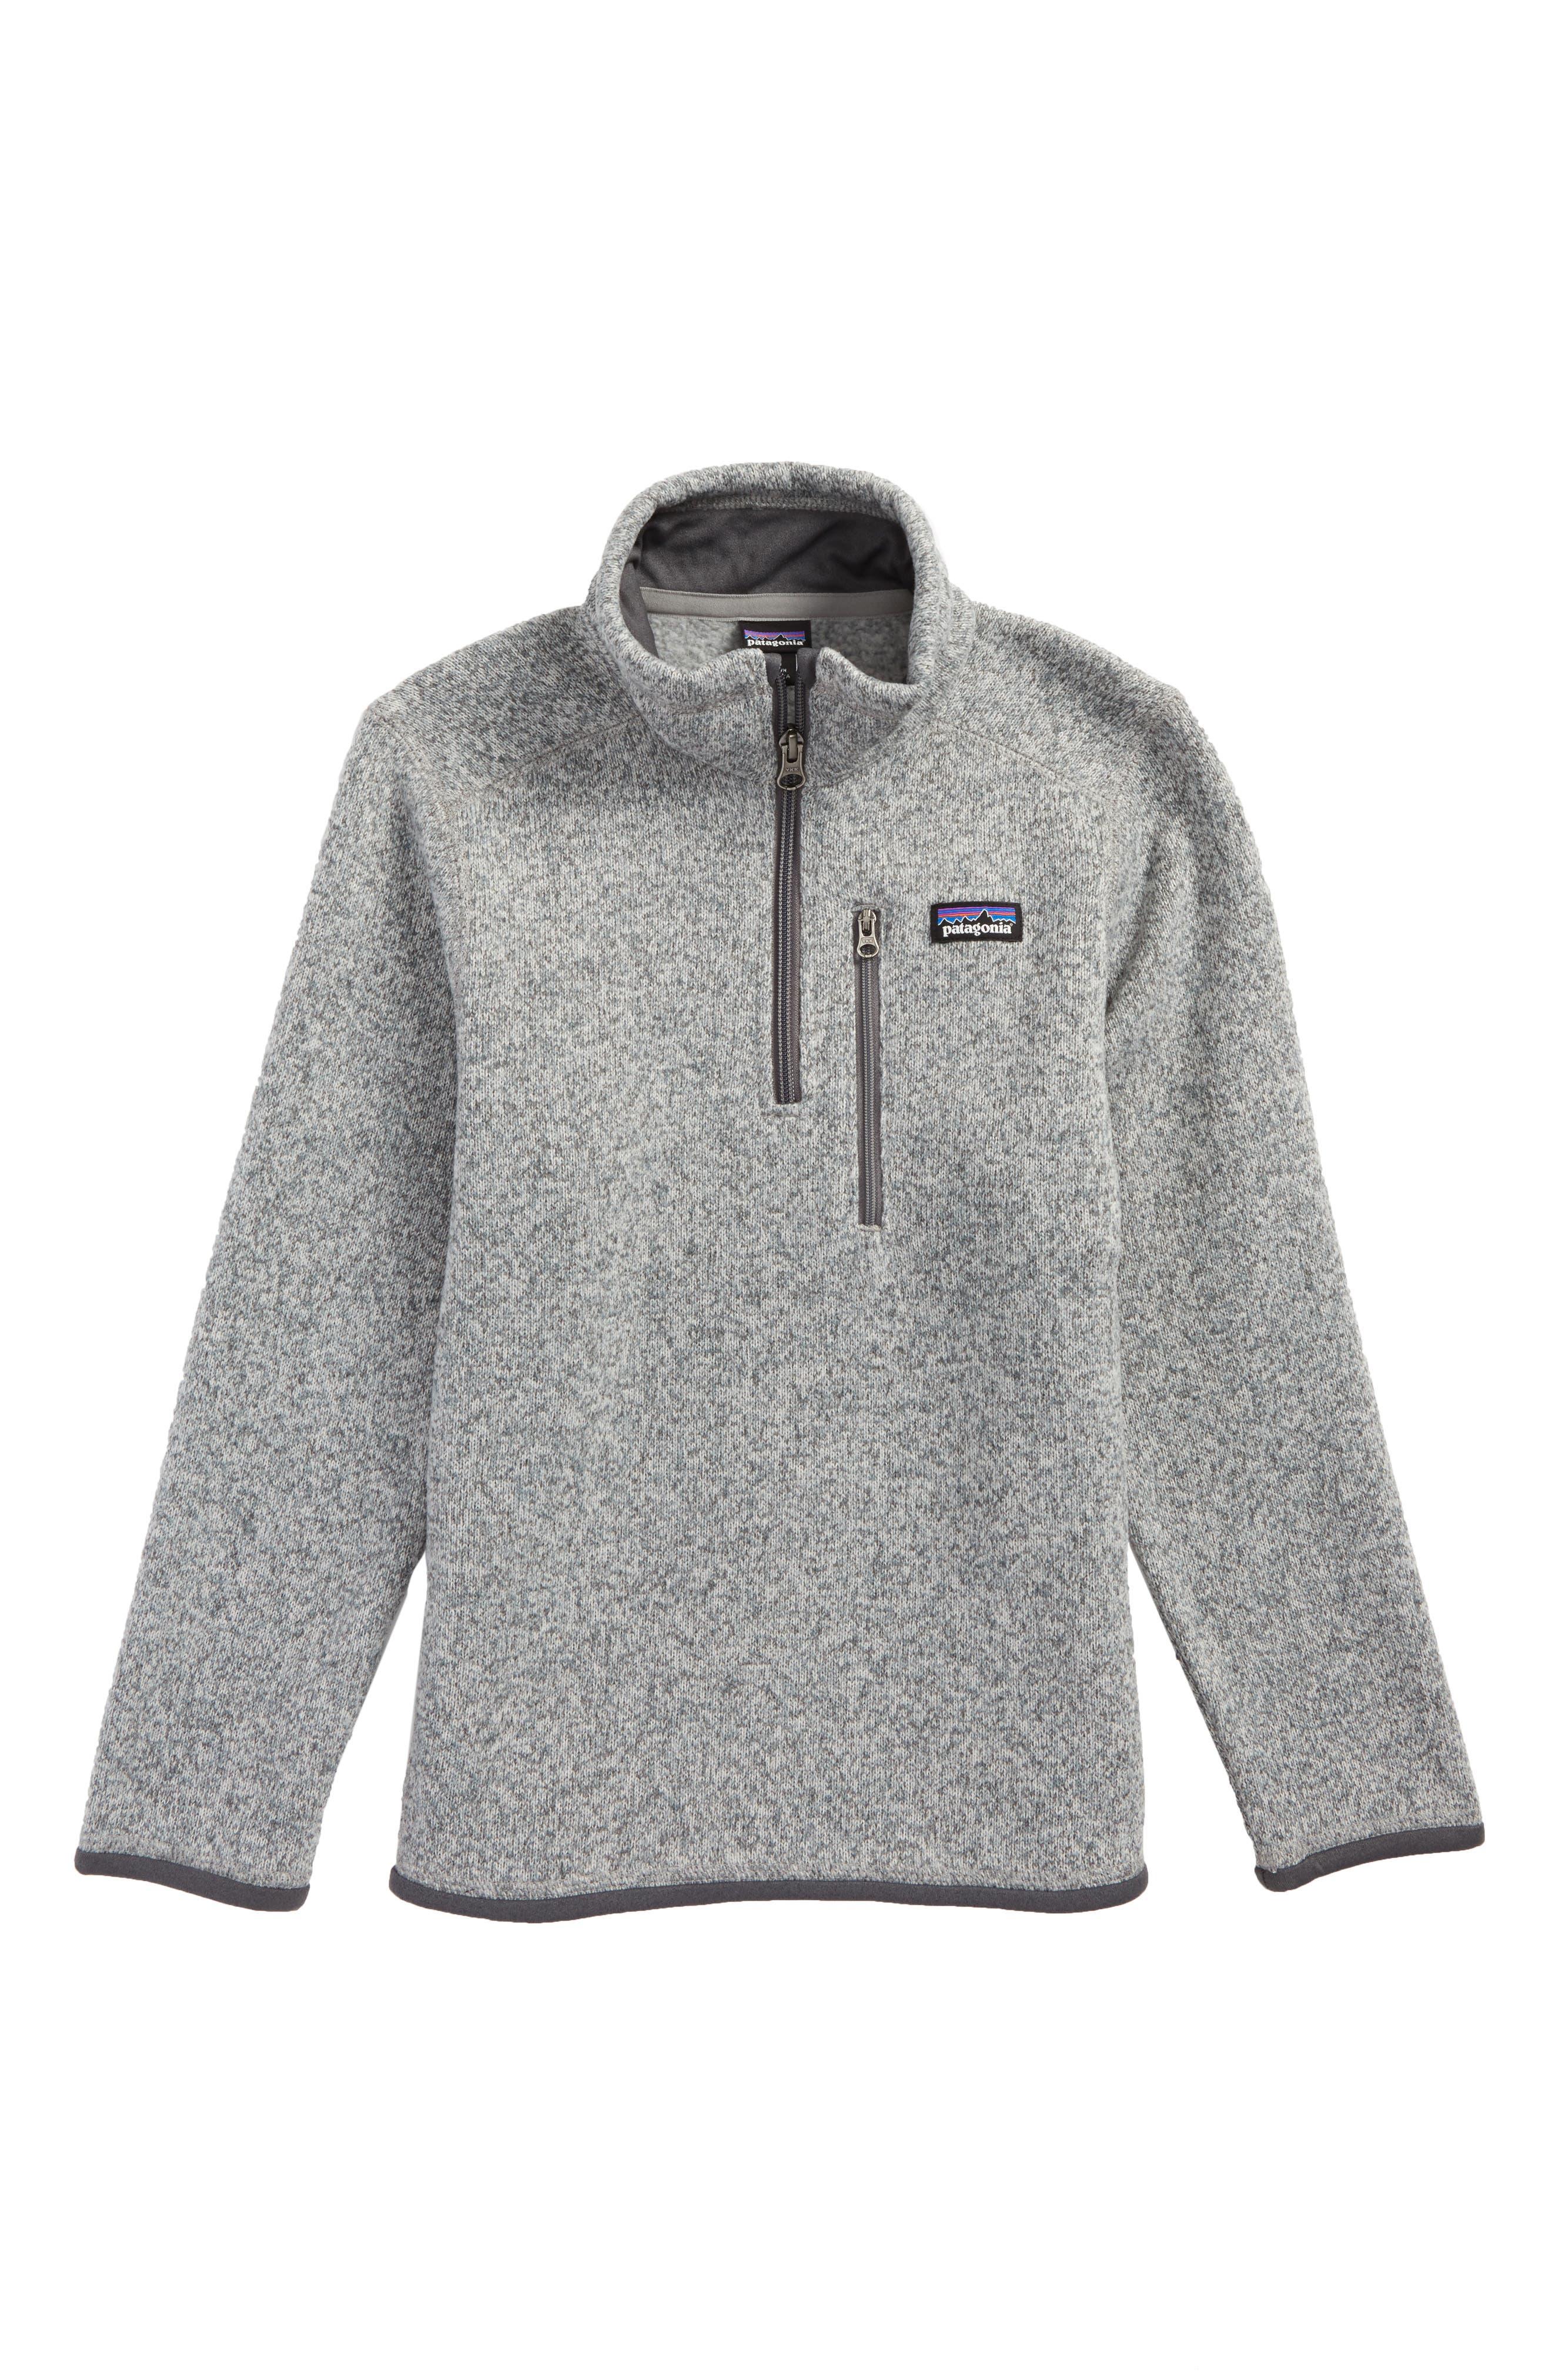 Better Sweater Quarter Zip Pullover,                             Main thumbnail 1, color,                             STONEWASH